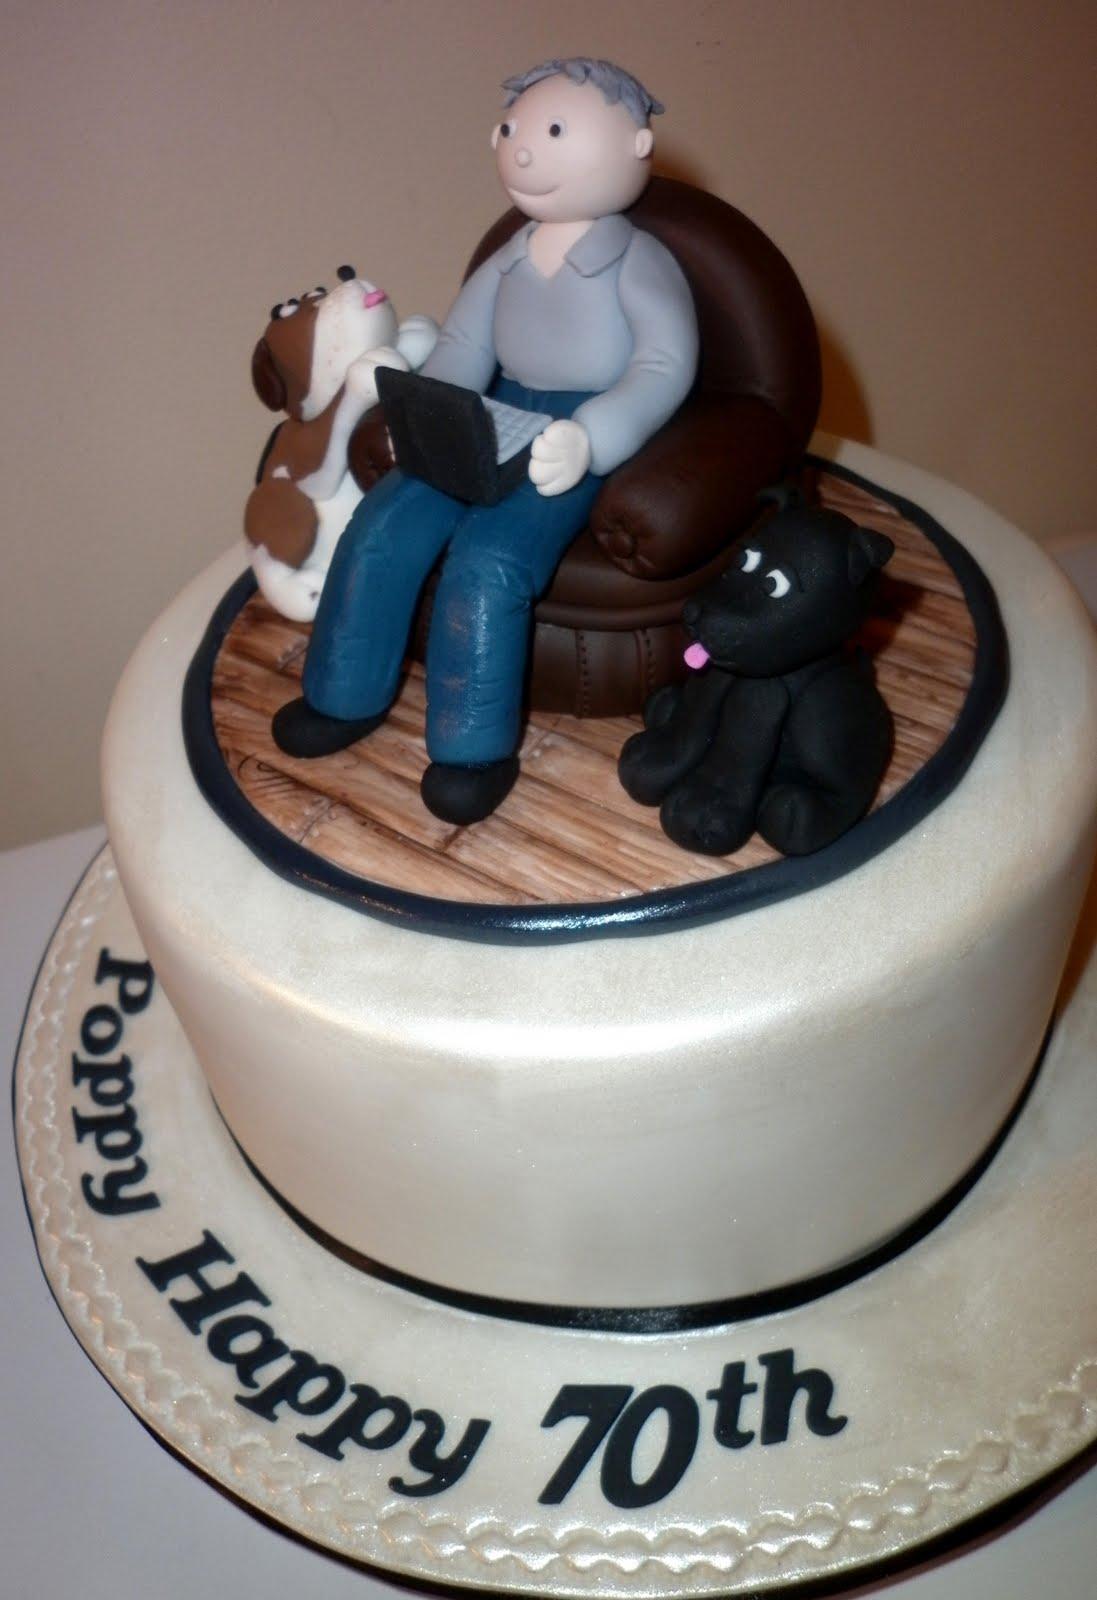 Man 70th Birthday Cake